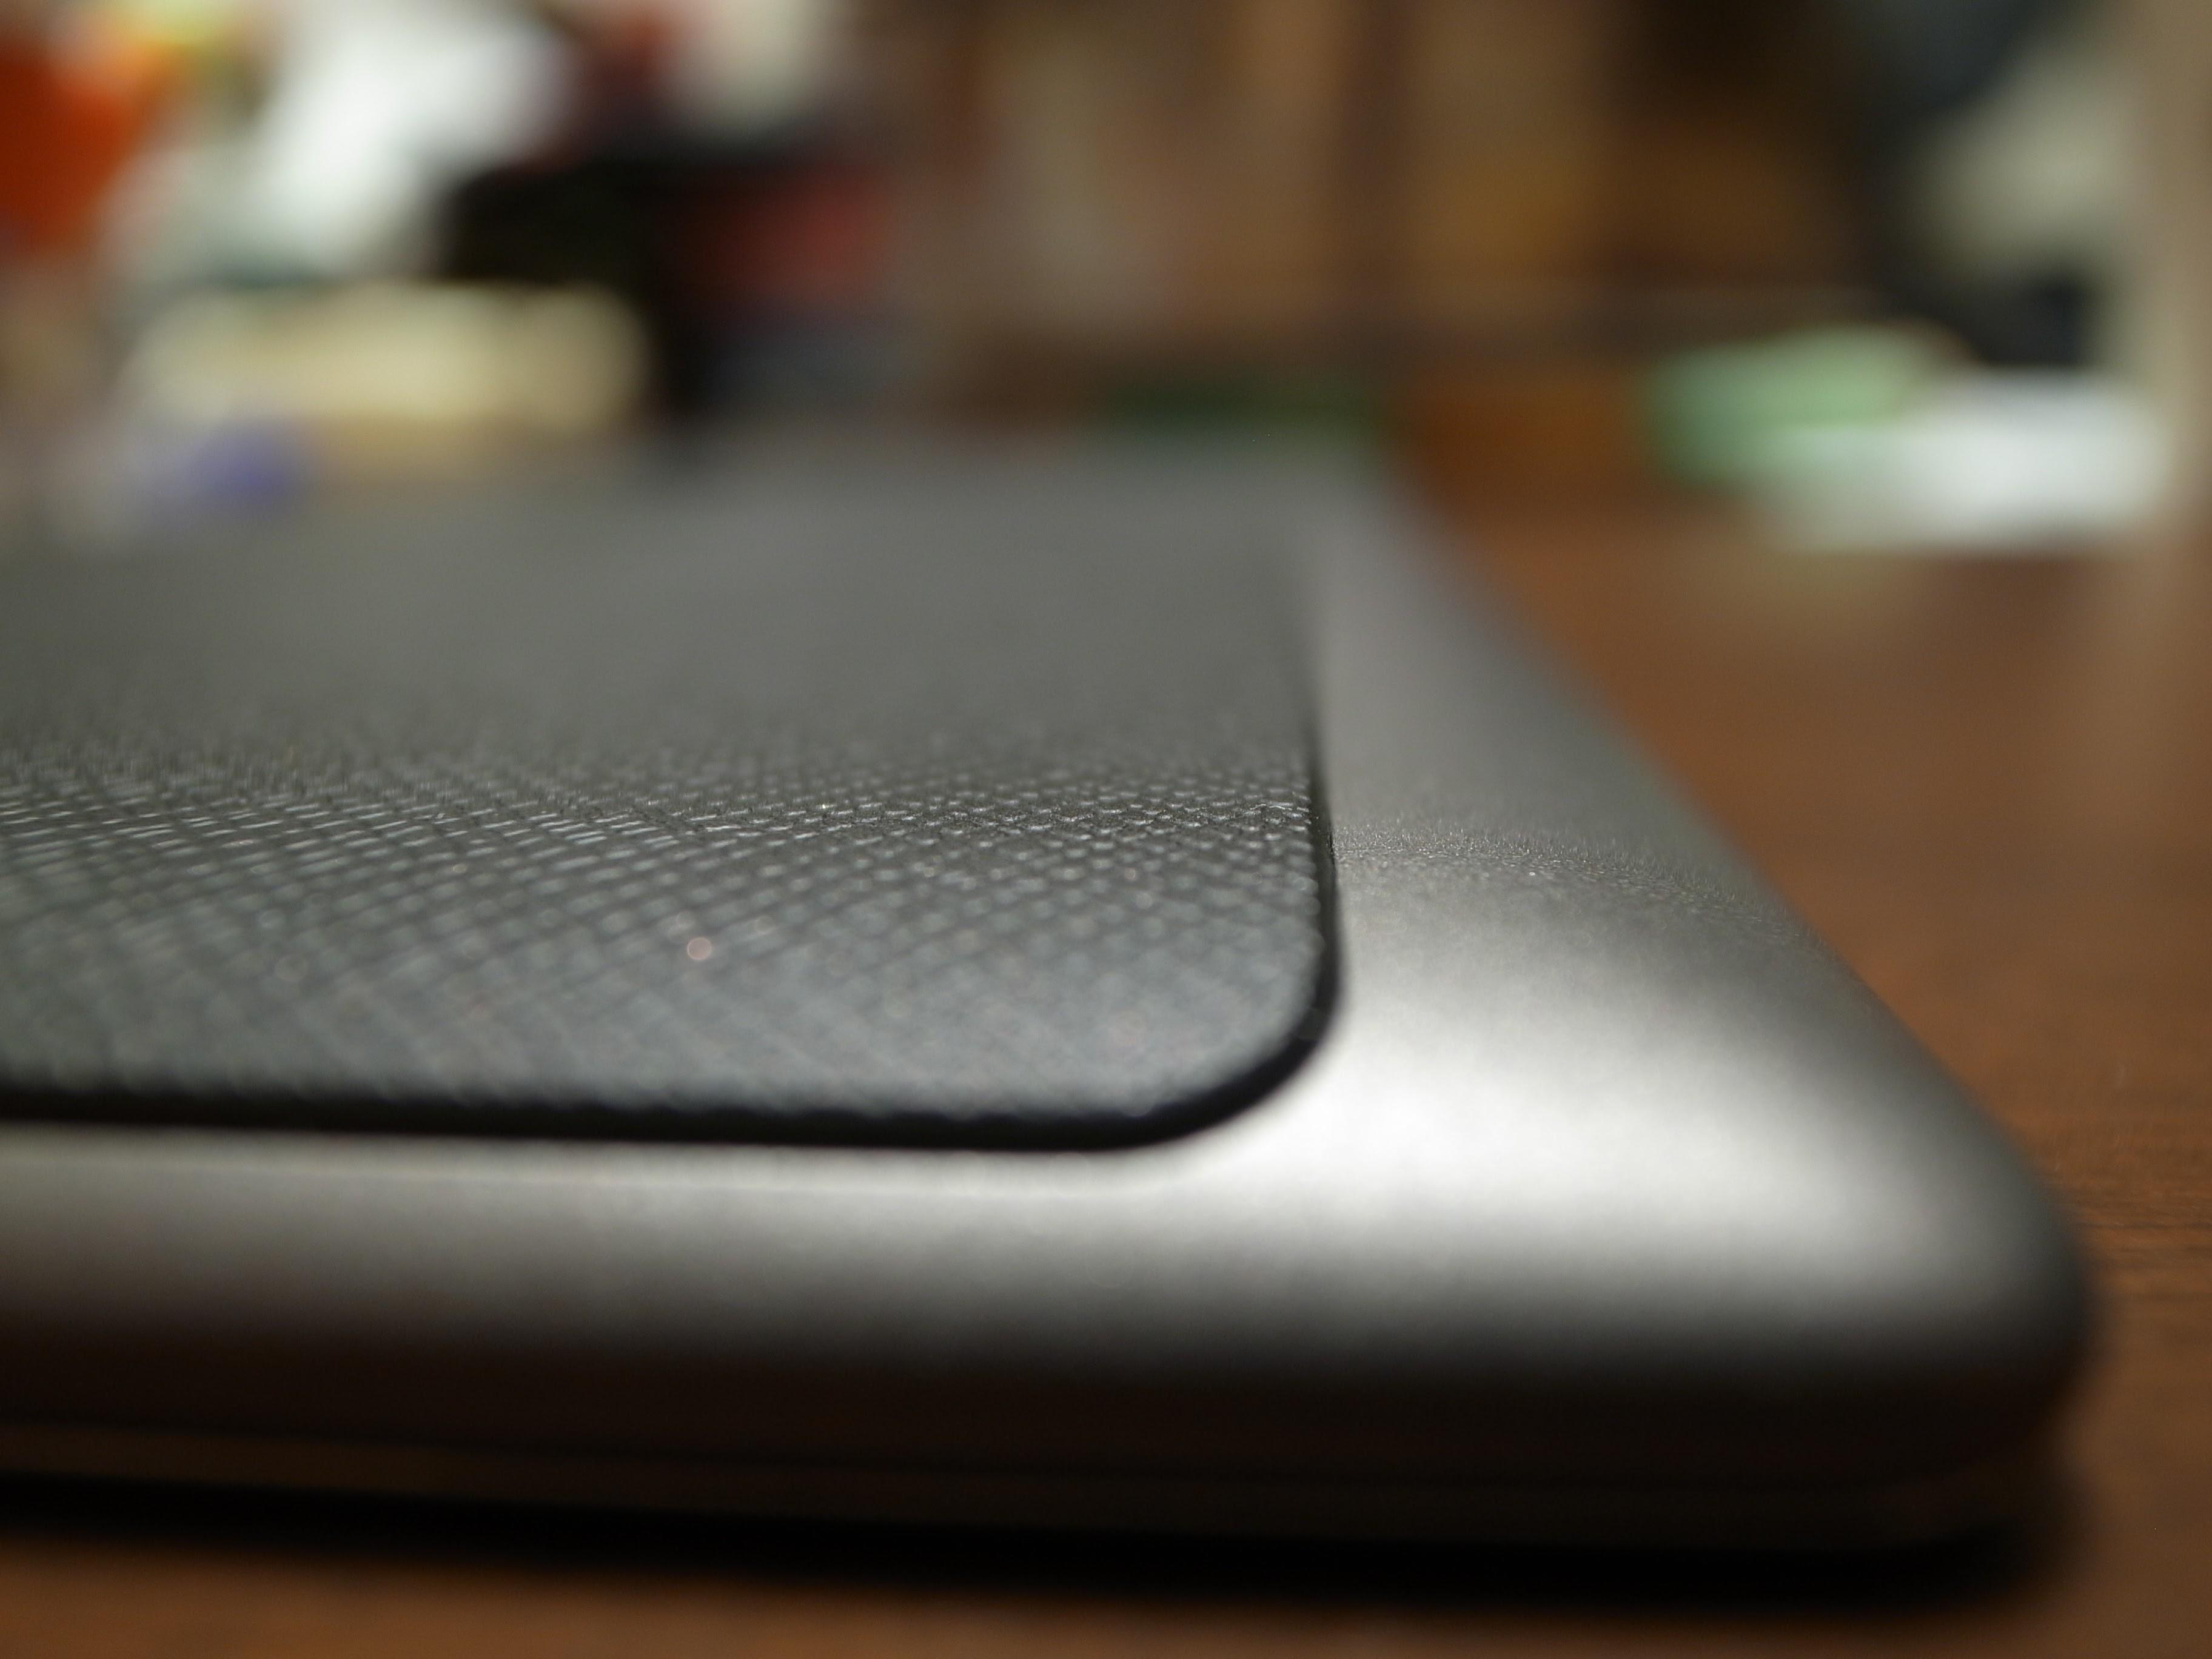 1006-201508_ASUS ZenPad Z370C 03